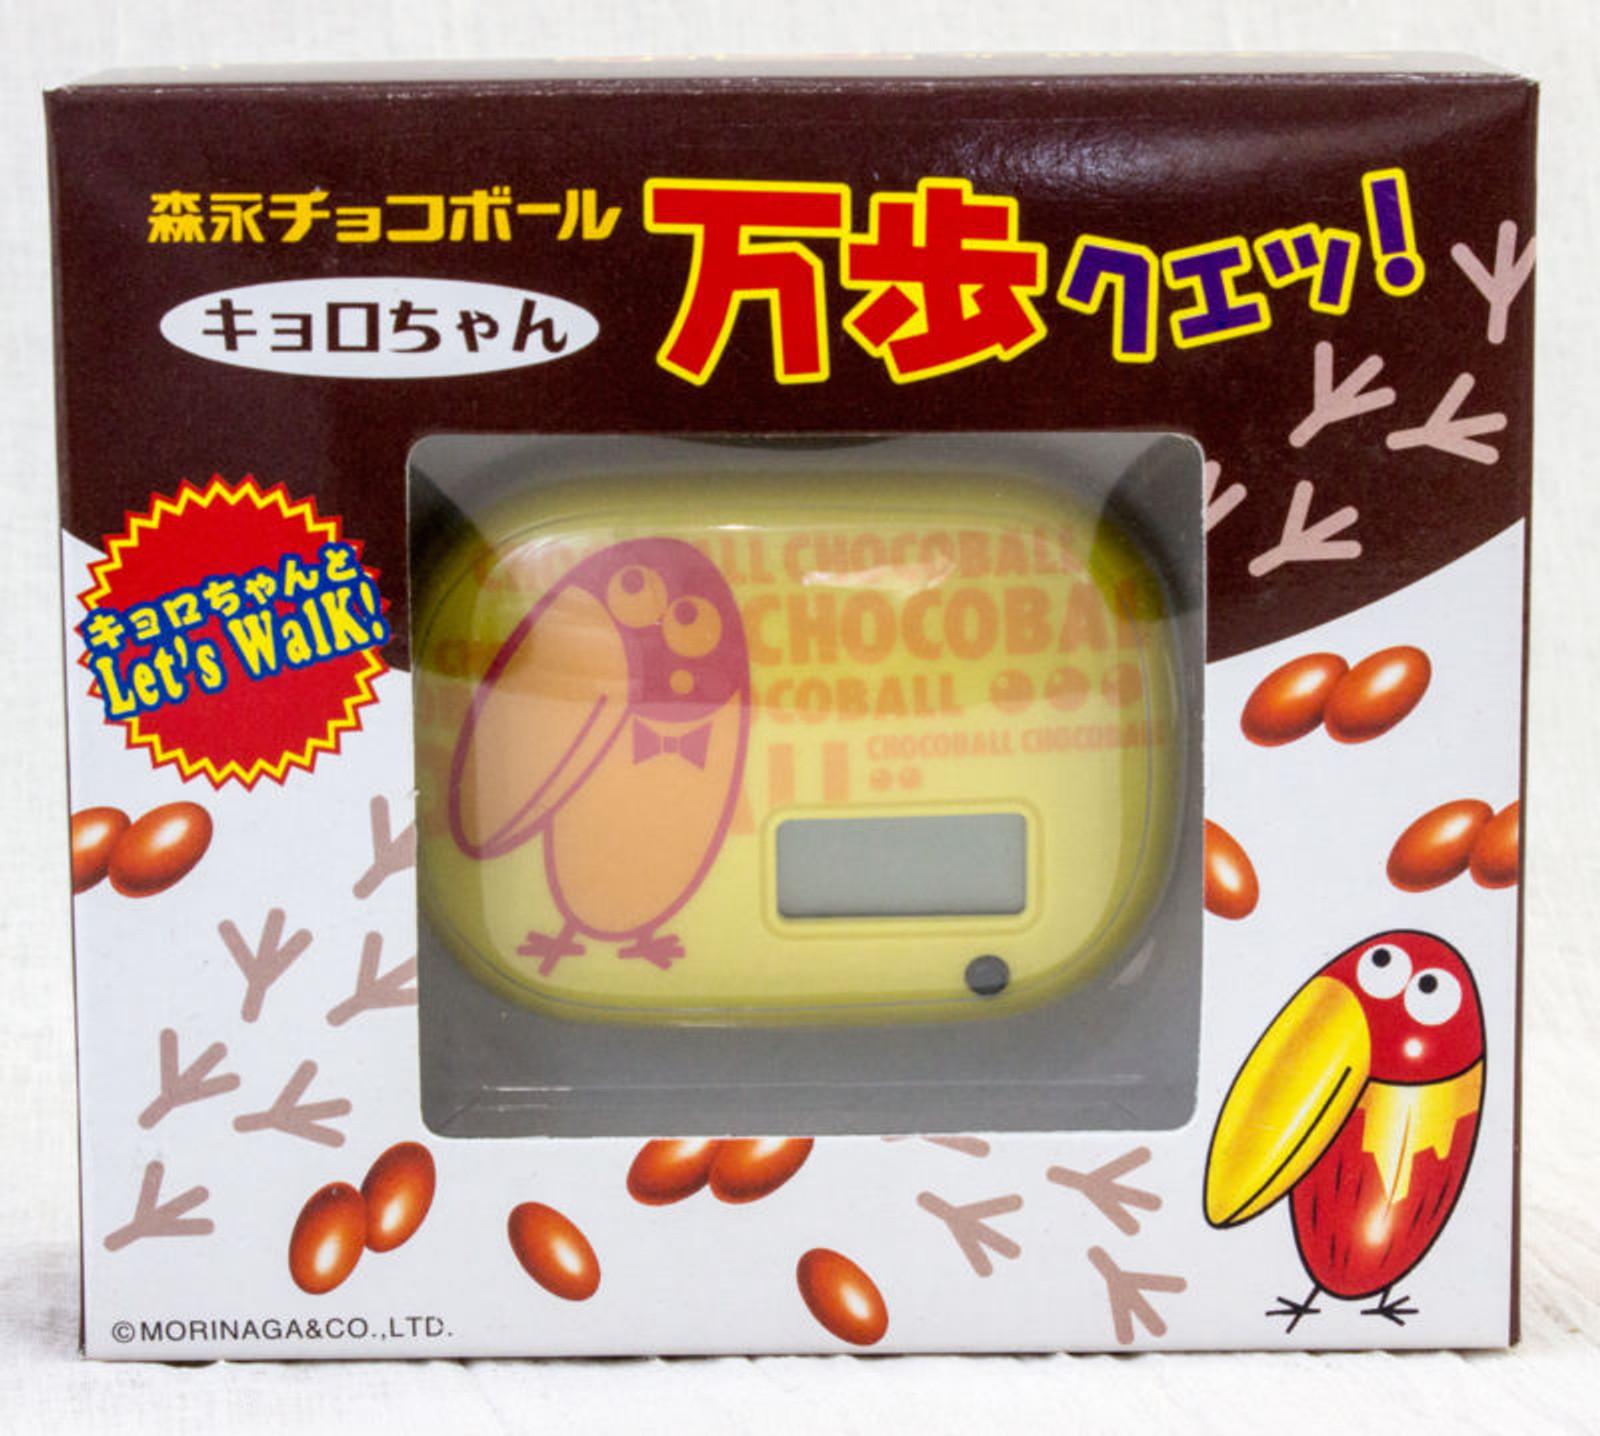 Kyoro-Chan Pedometer Choco Ball Morinaga SEGA JAPAN ANIME MANGA